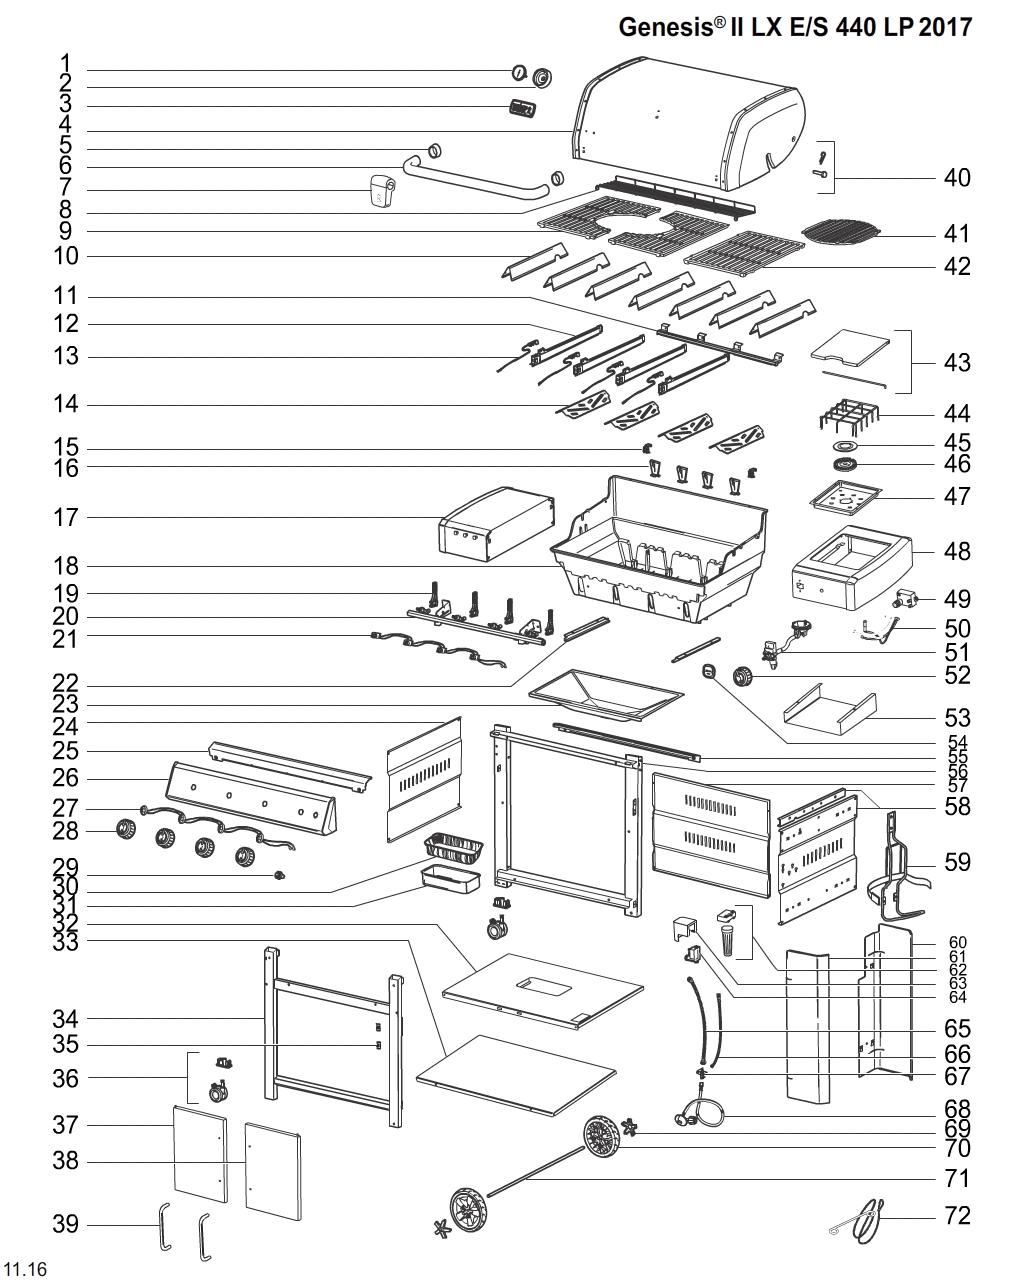 [DIAGRAM_5UK]  Weber Grill Schematics   Weber Grill Models   Weber Wiring Diagrams      Weber Grill Schematics   Weber Grill Models